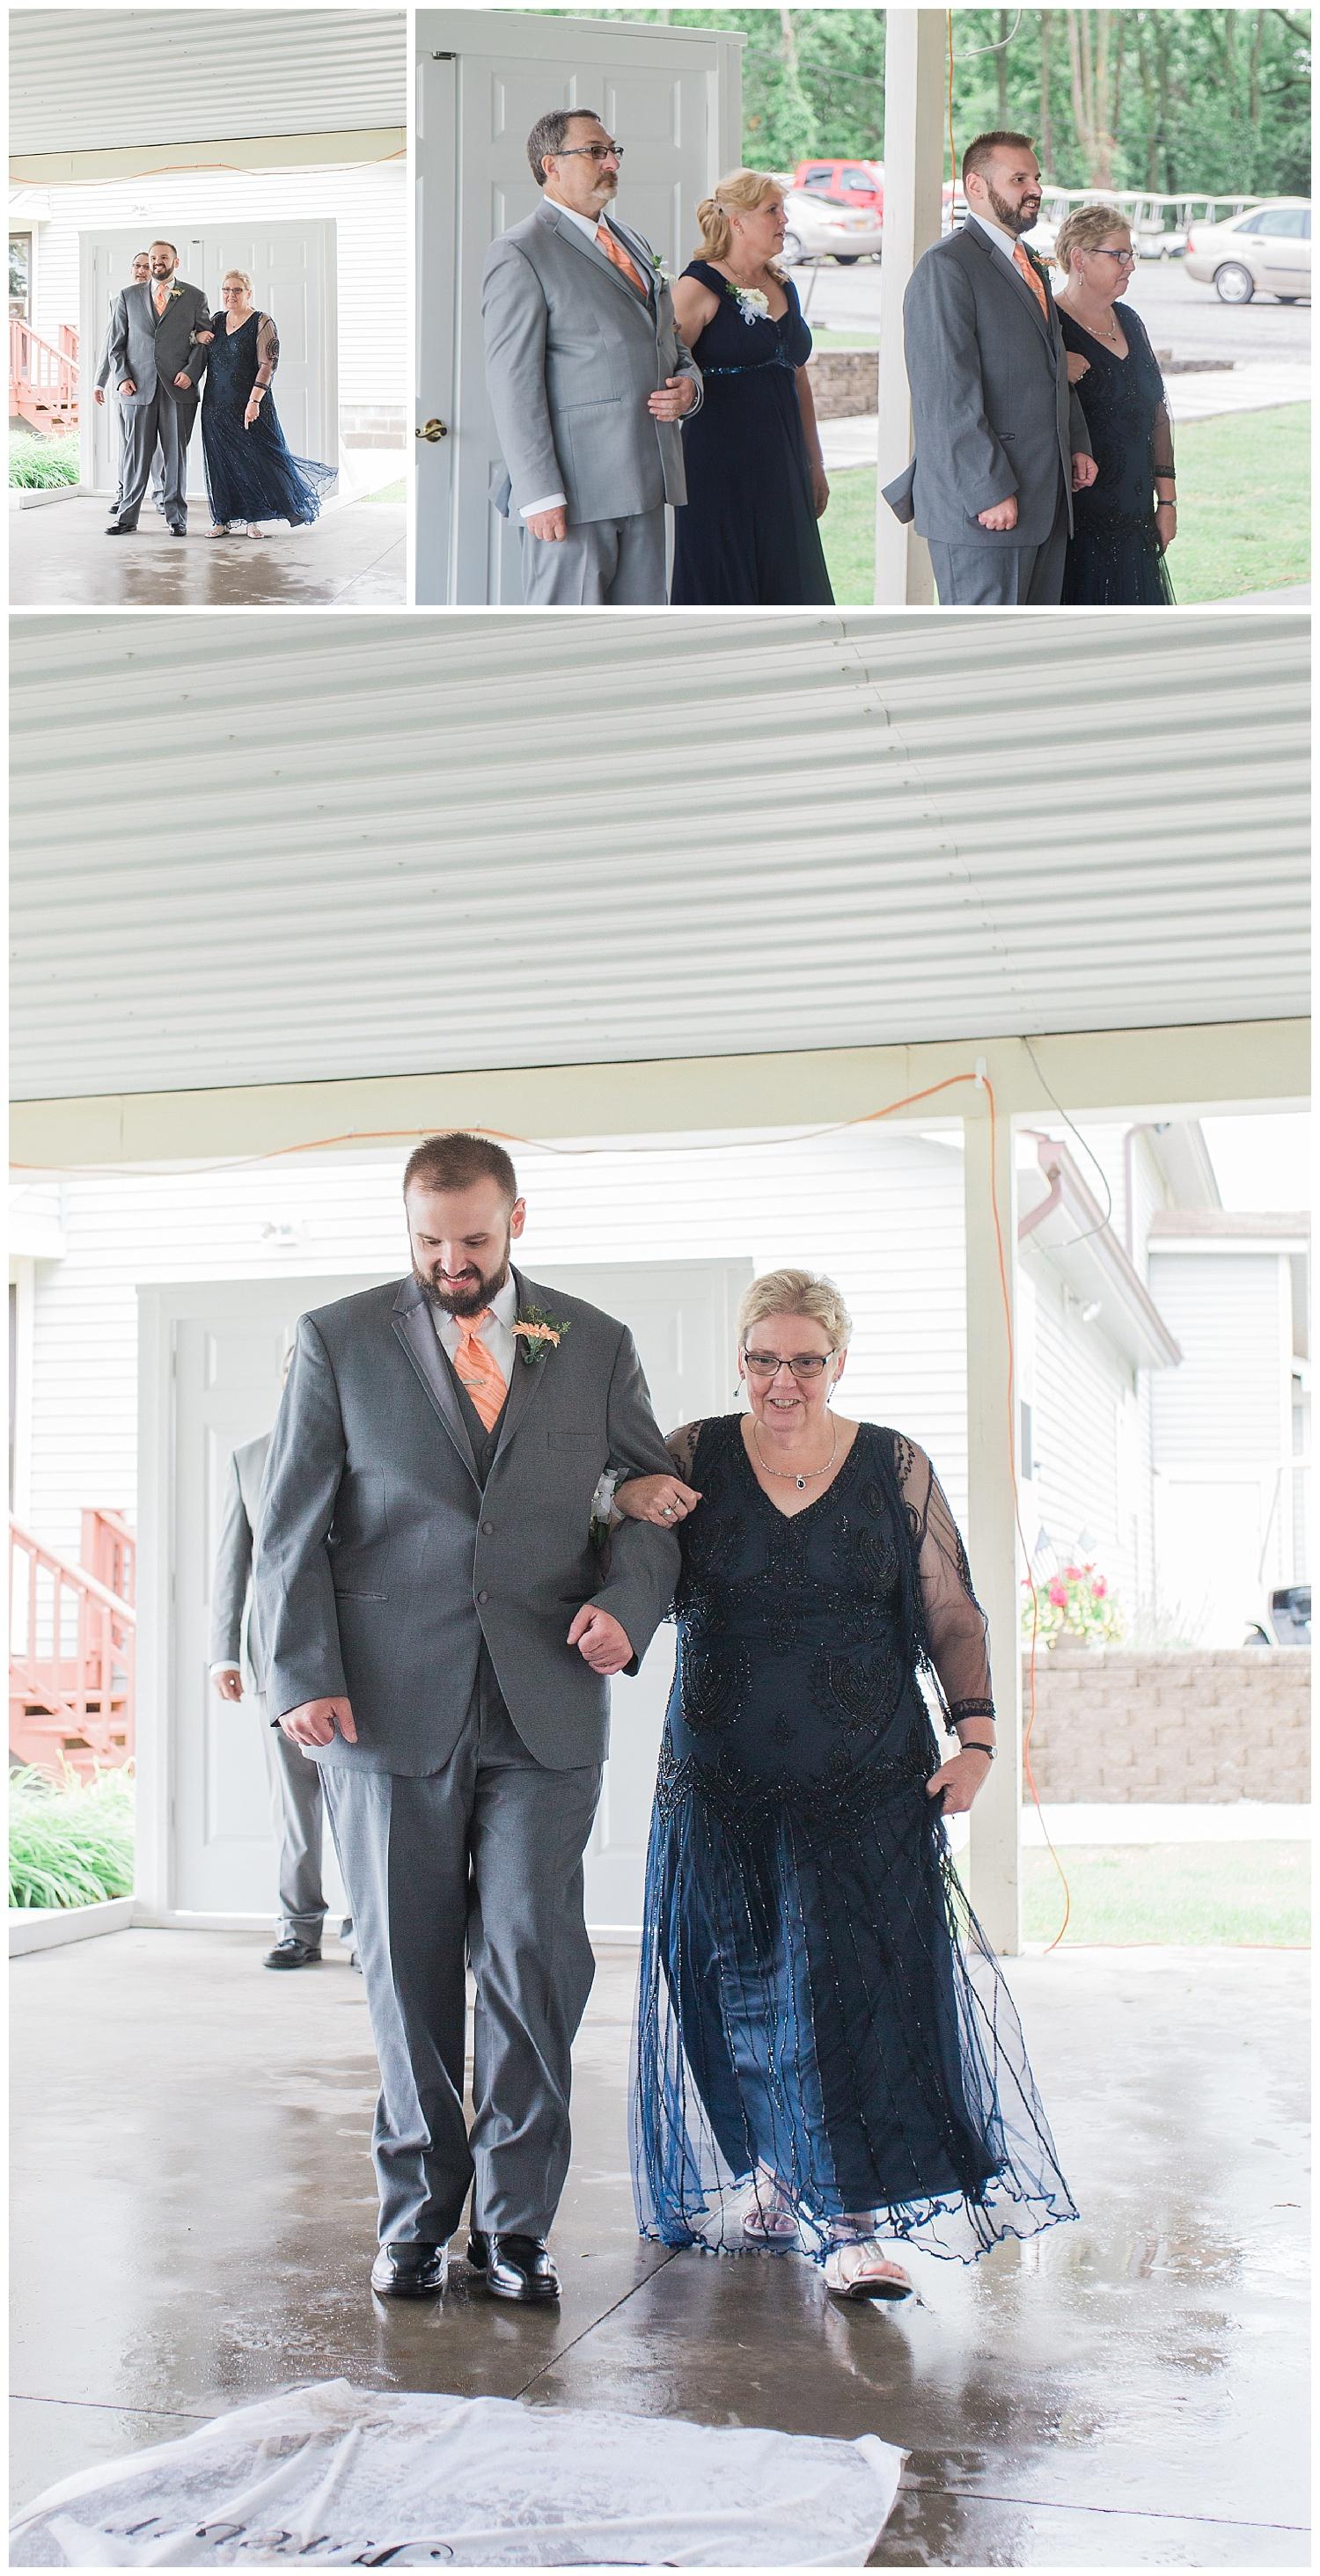 Brian and Molly Wed in Conesus NY - Lass & Beau-169_Buffalo wedding photography.jpg